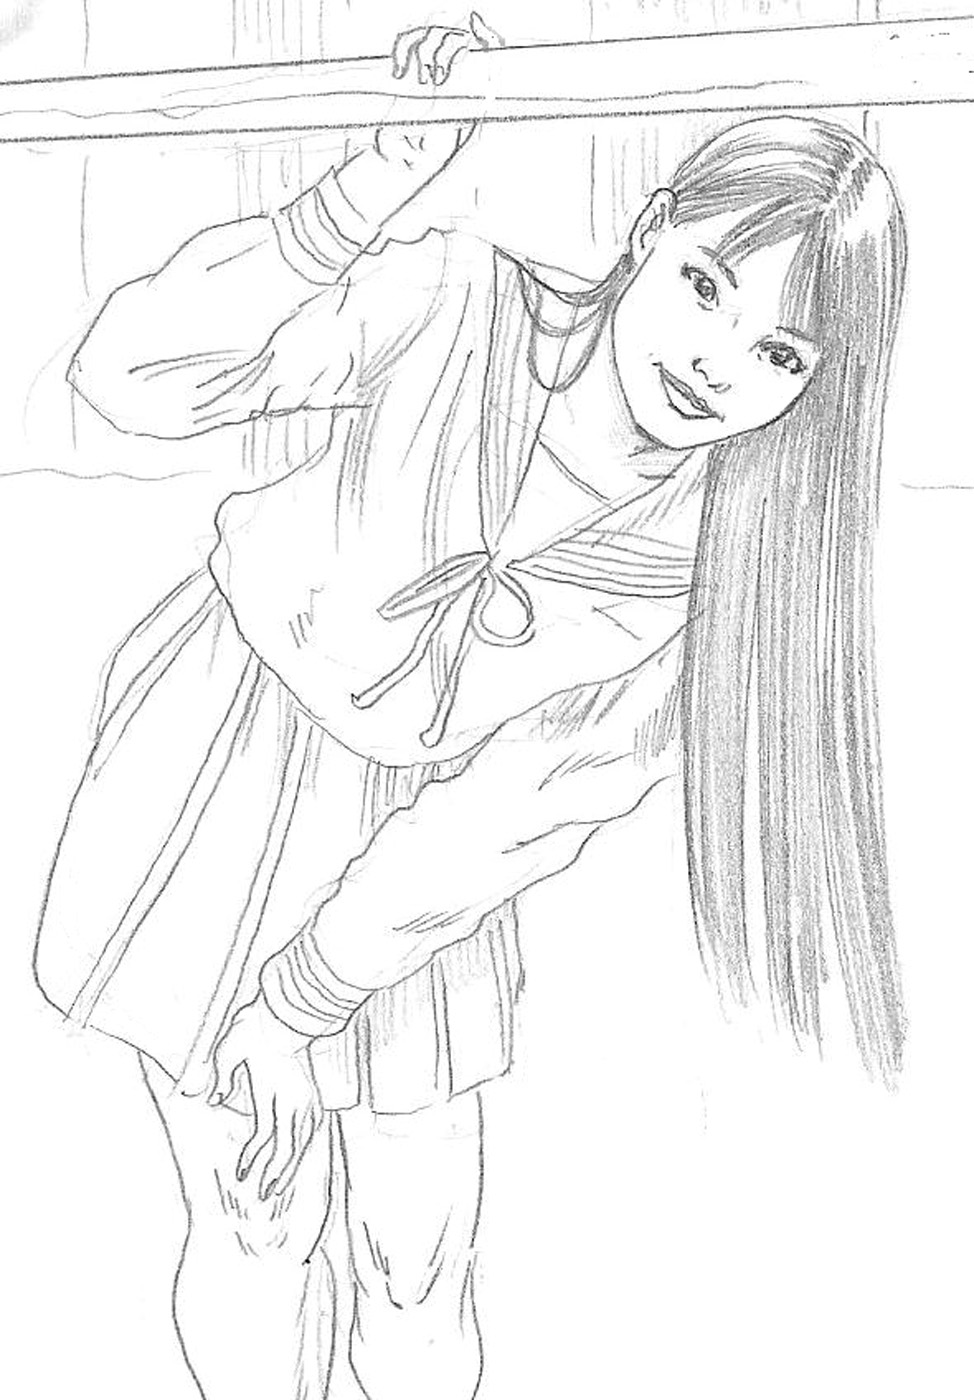 Sketch of random Pinterest image